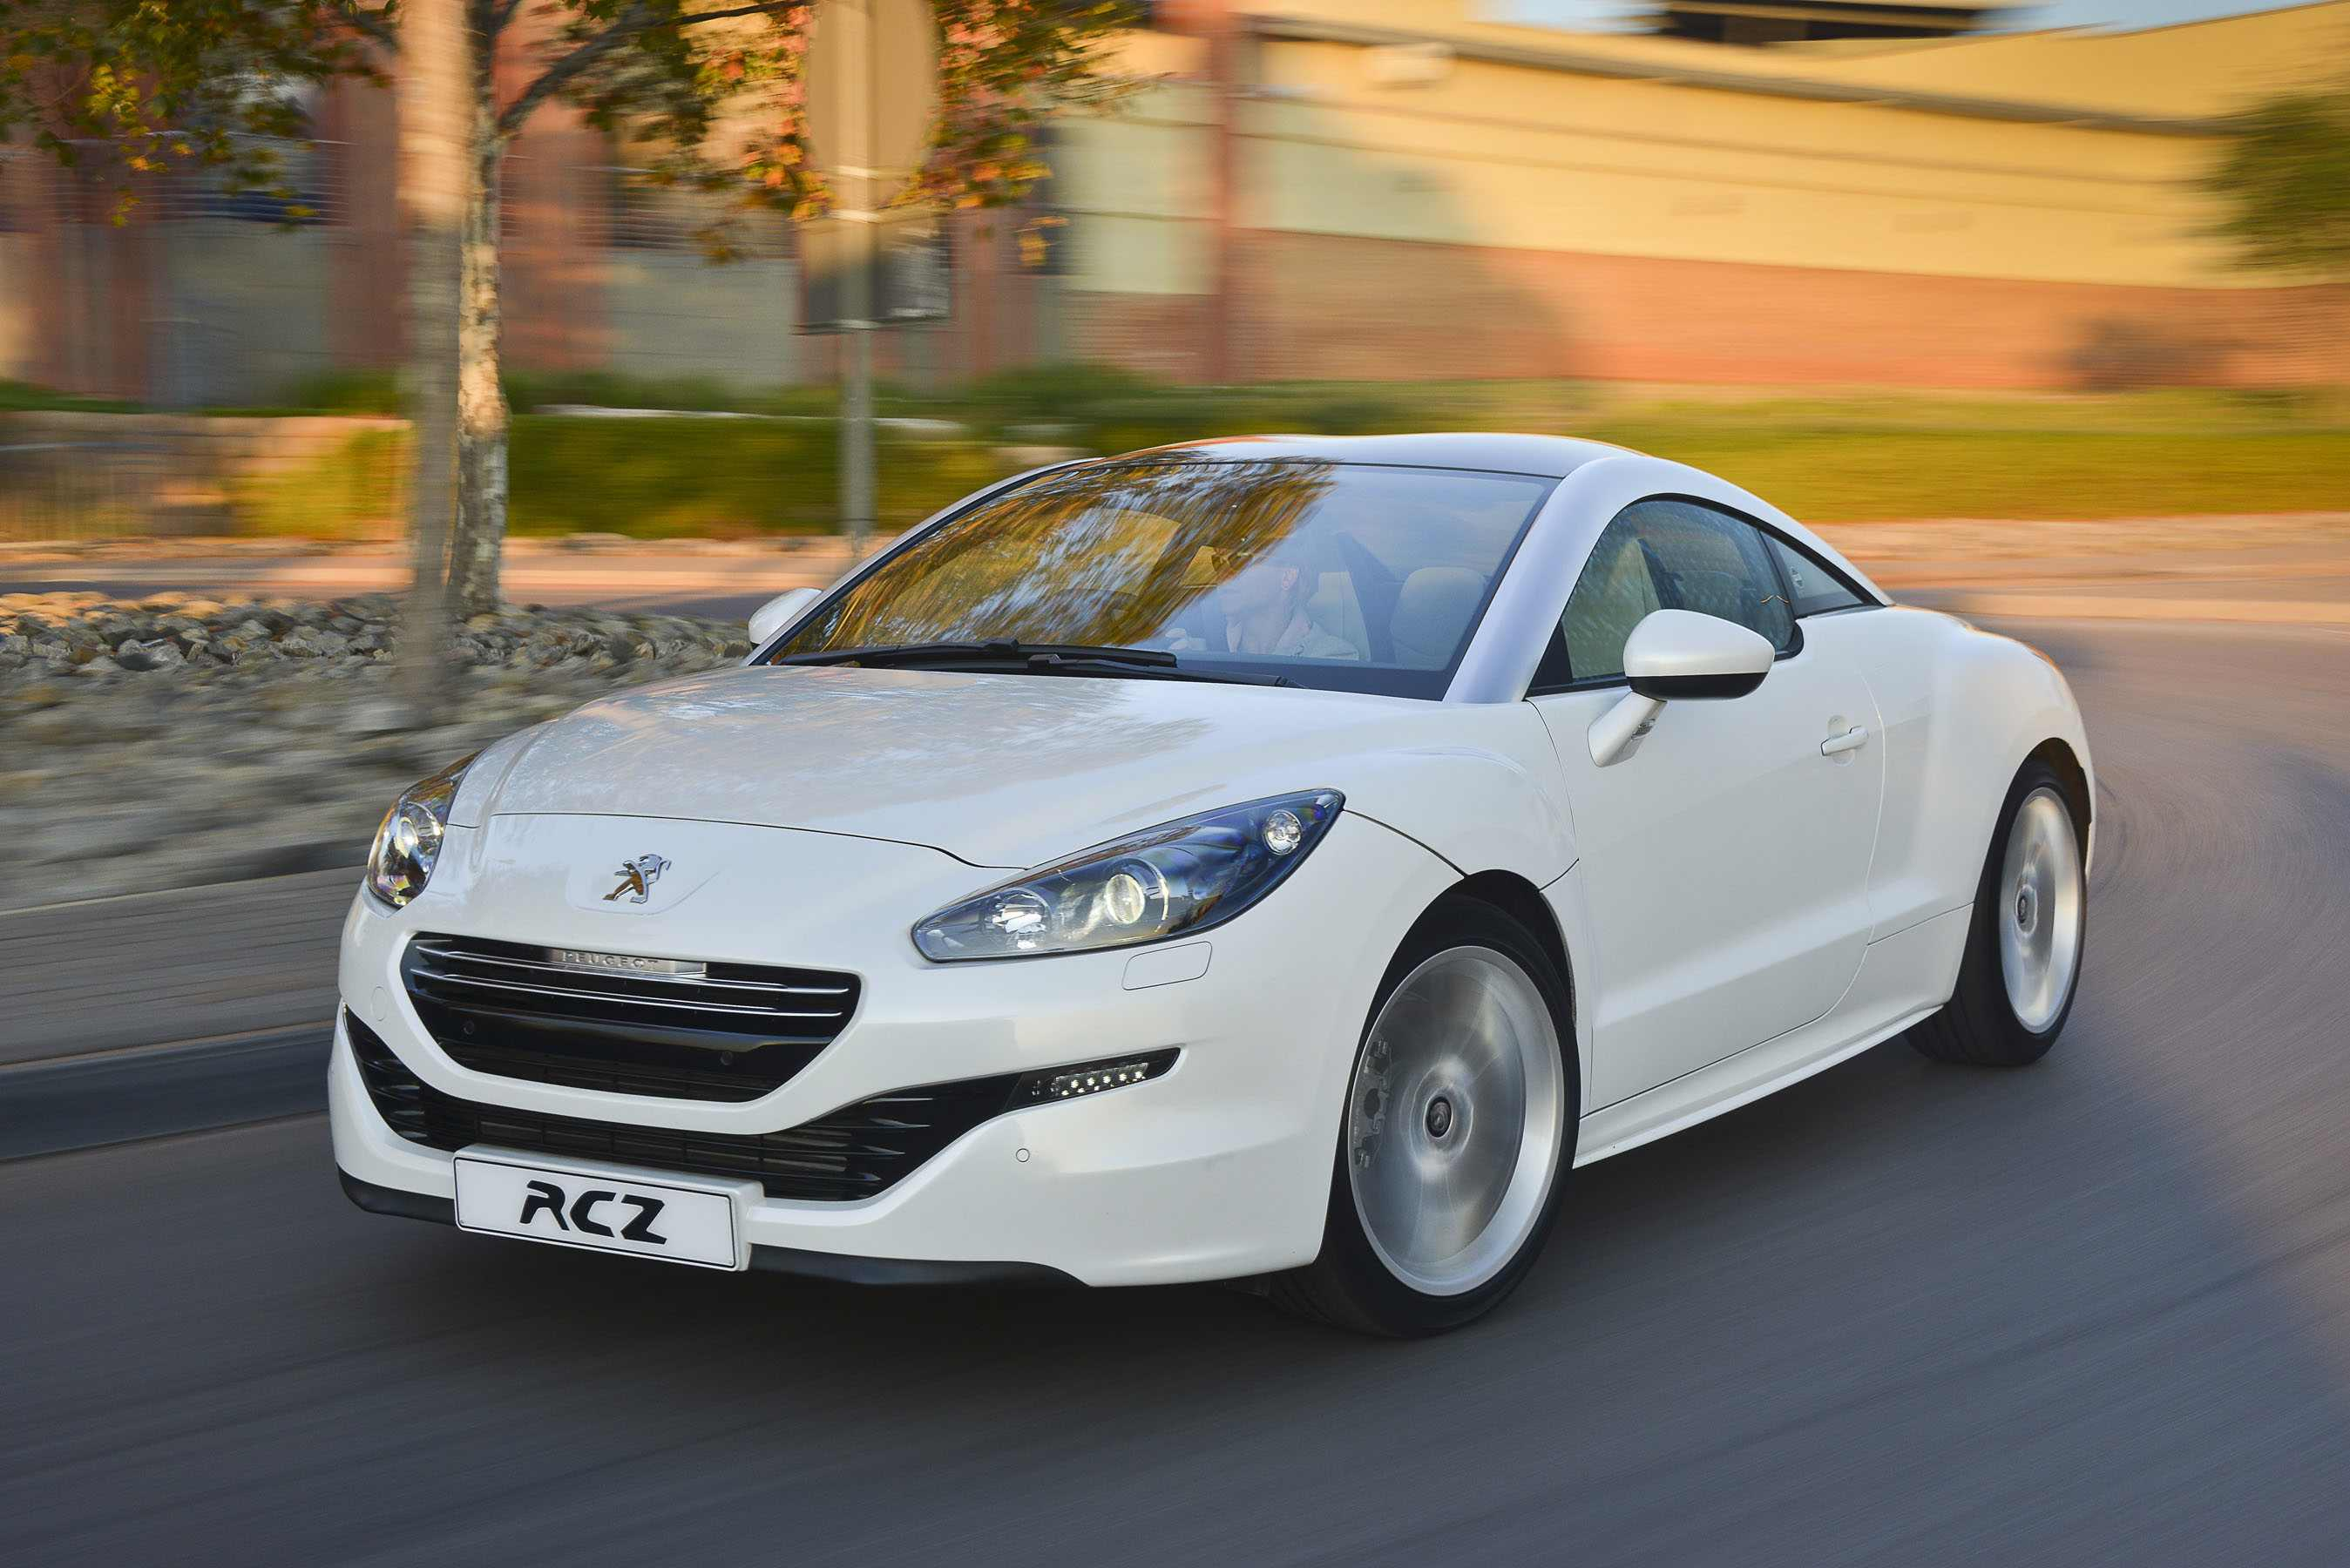 Peugeot RCZ 1.6 THP (2014): New Car Review